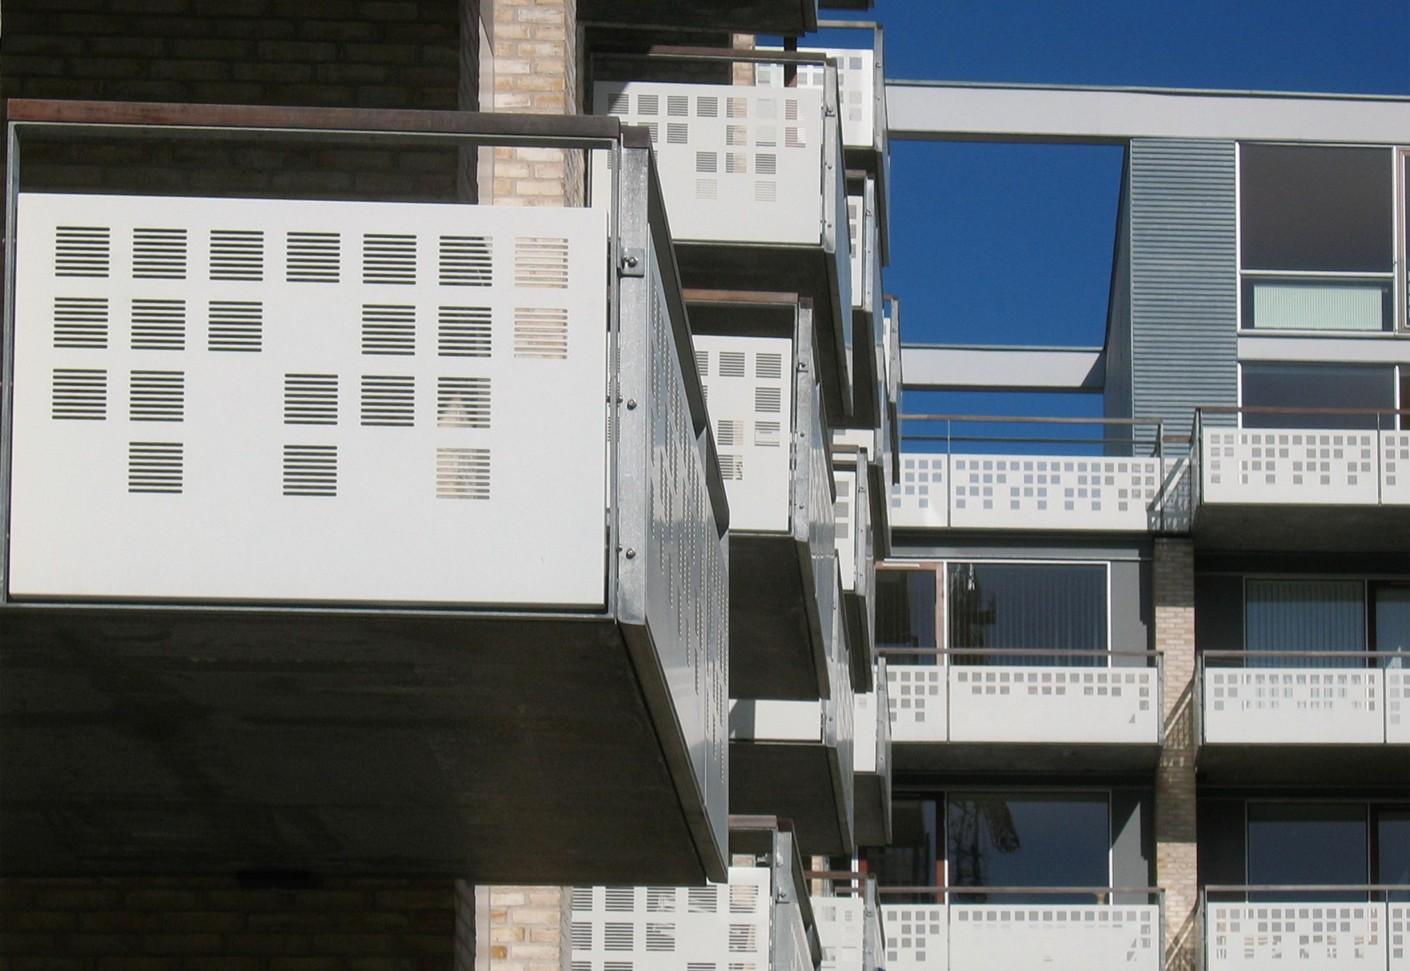 lochblech balkonverkleidungen teglholm von rmig stylepark. Black Bedroom Furniture Sets. Home Design Ideas